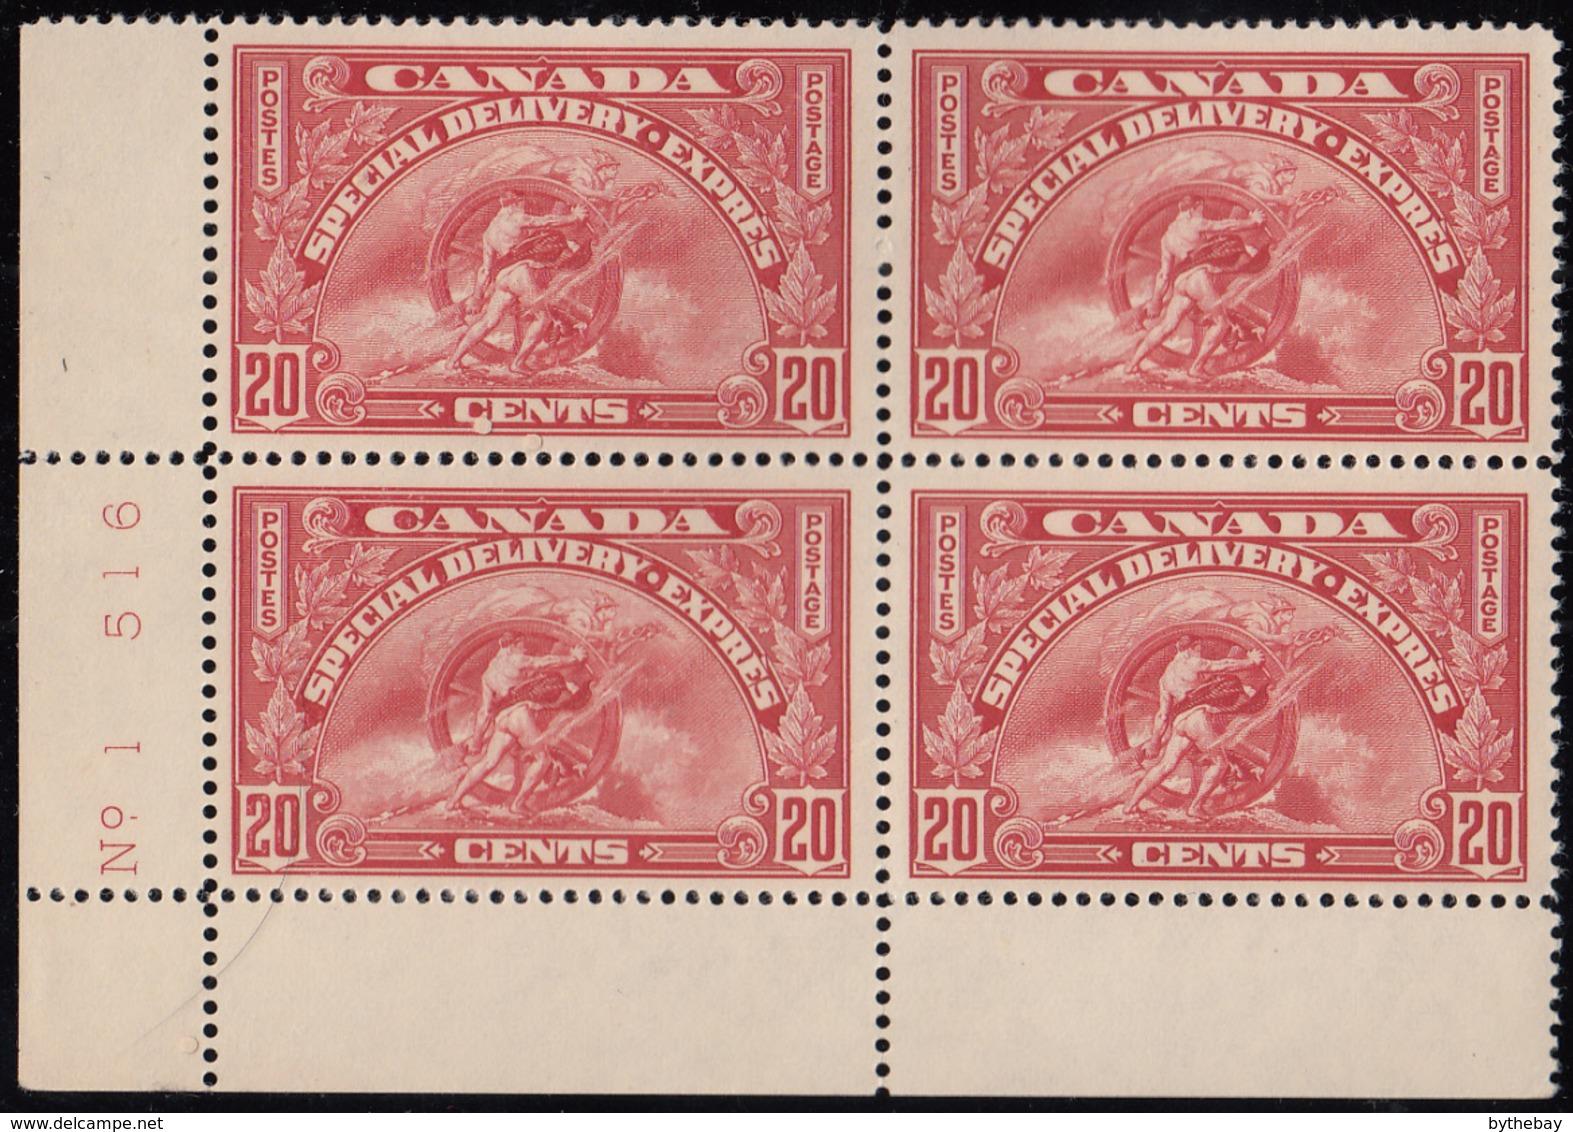 Canada 1935 MNH Sc E6 20c Mercury, Wheel Plate 1 Lower Left Plate Block - Exprès